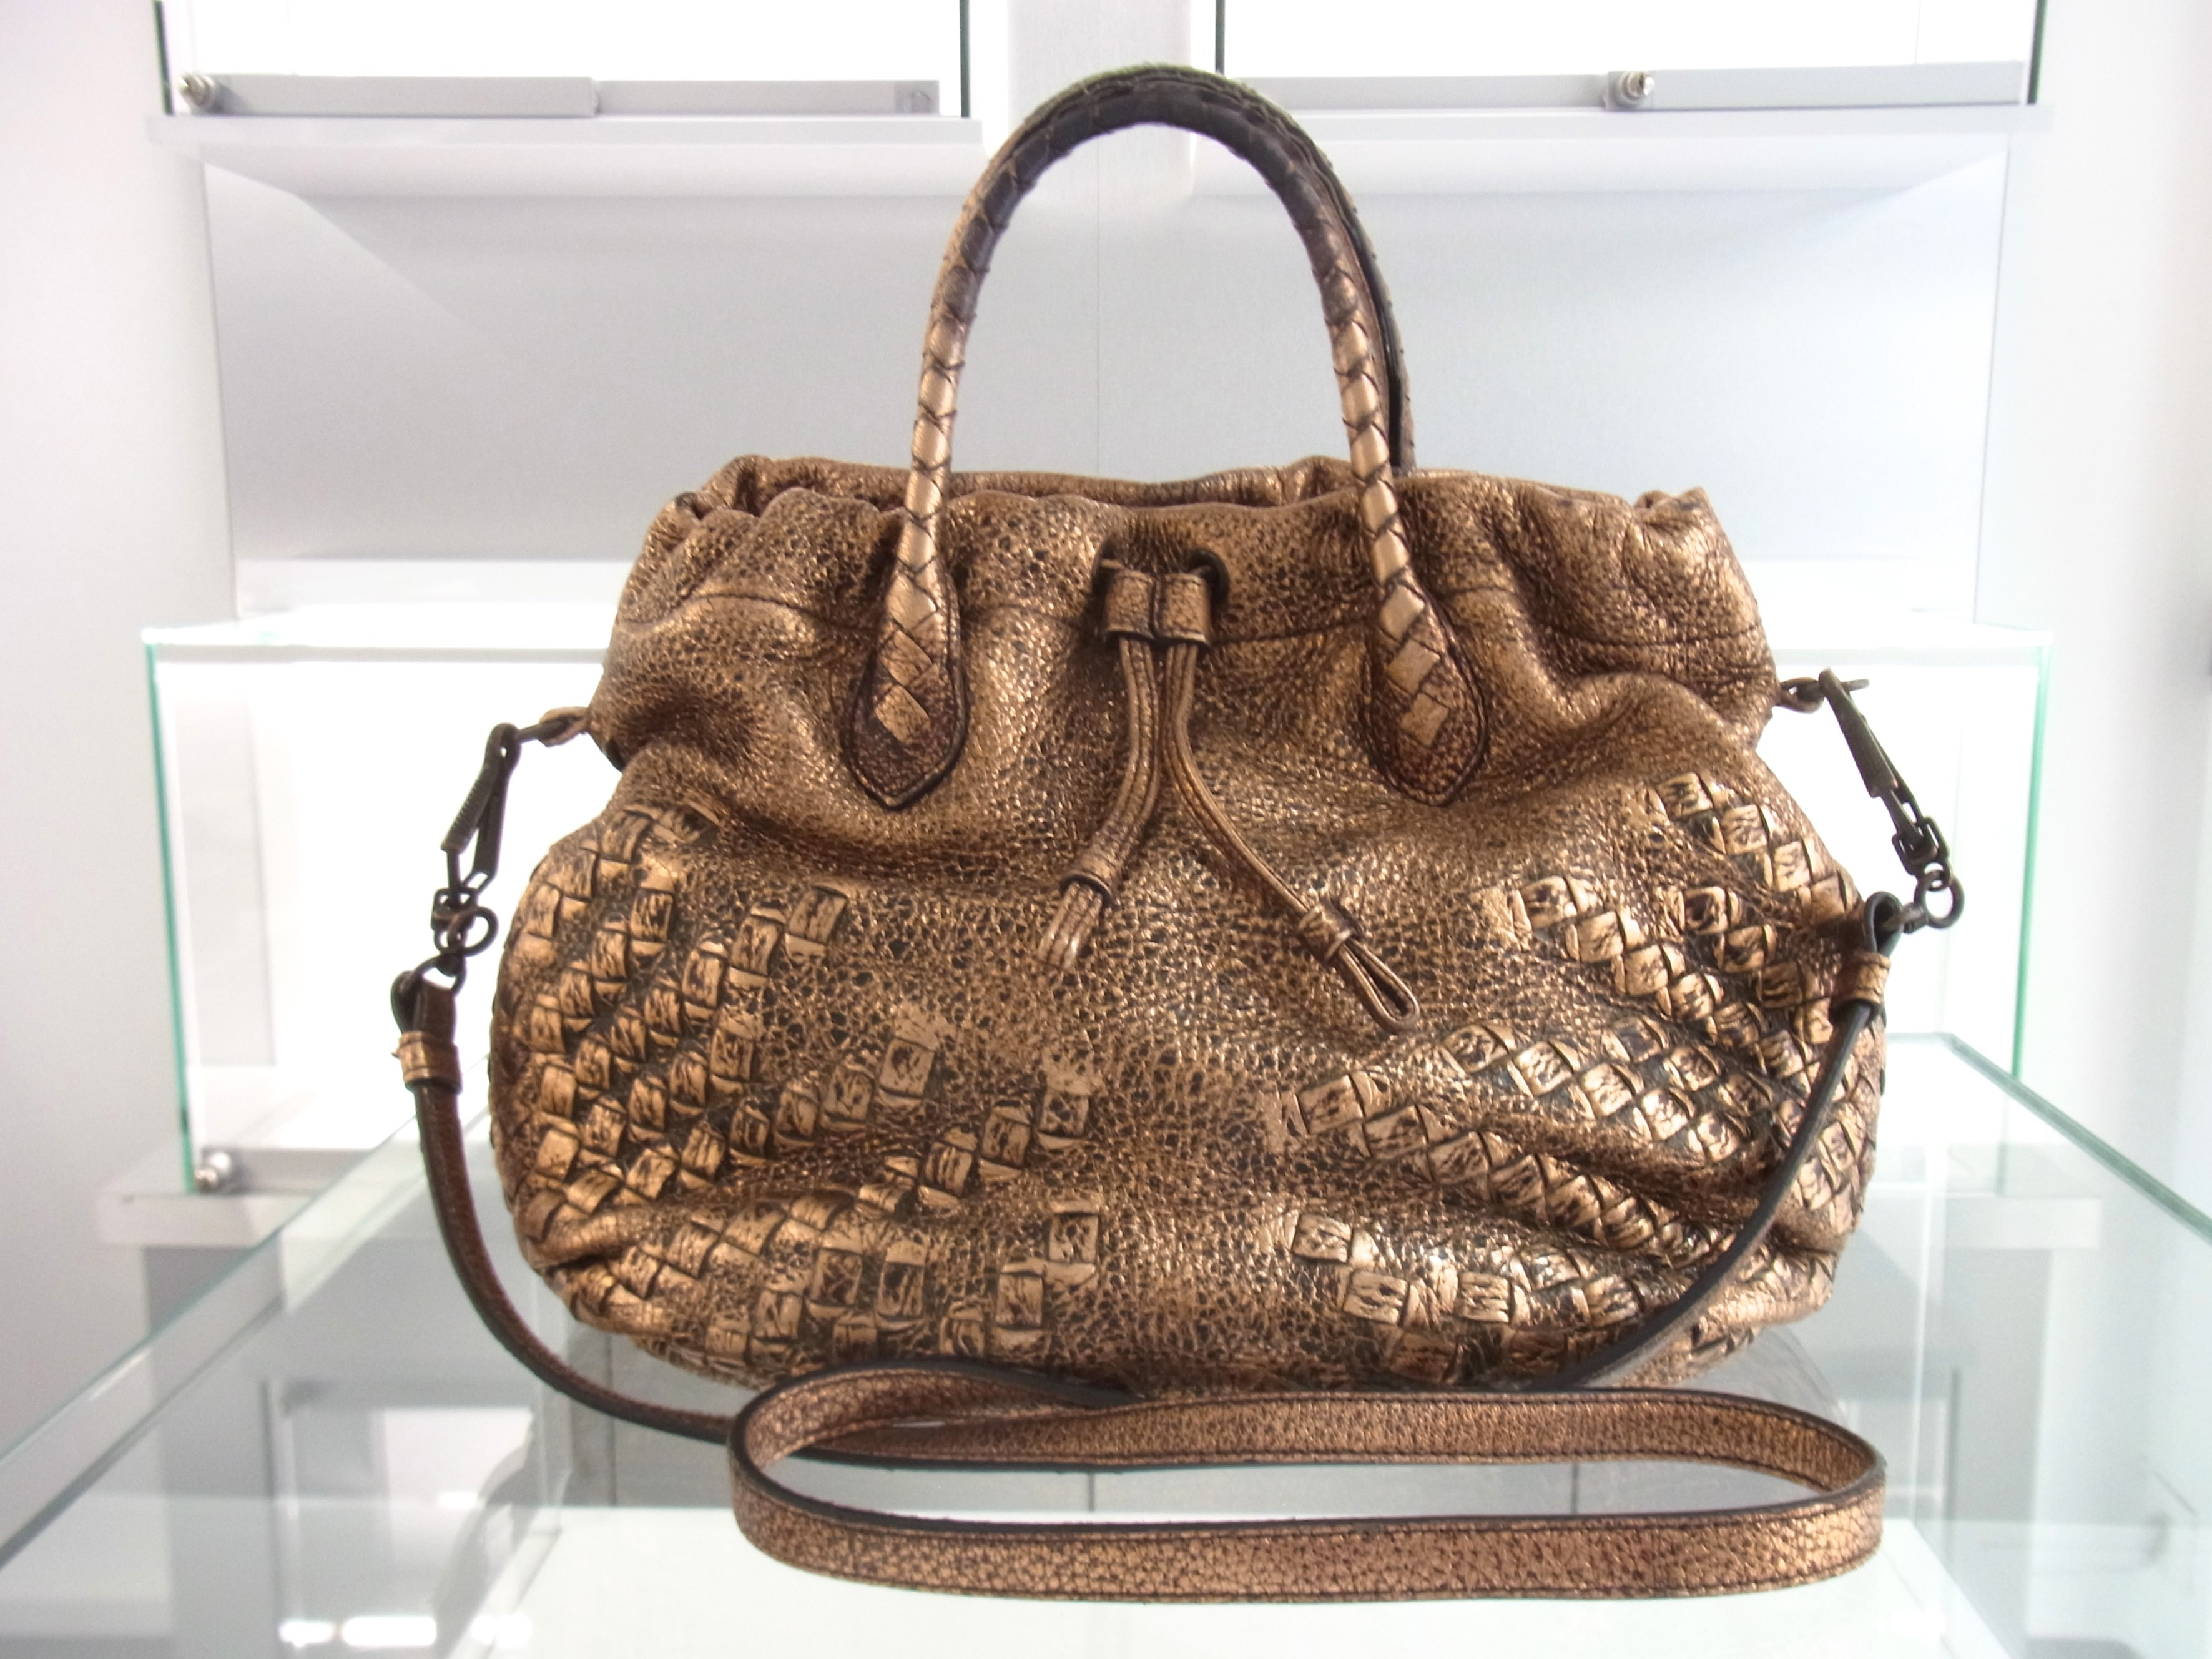 d4b22d72436a2 Bottega Veneta Tasche Leder Metallic Oro Scuro Nappa Leather bag ...